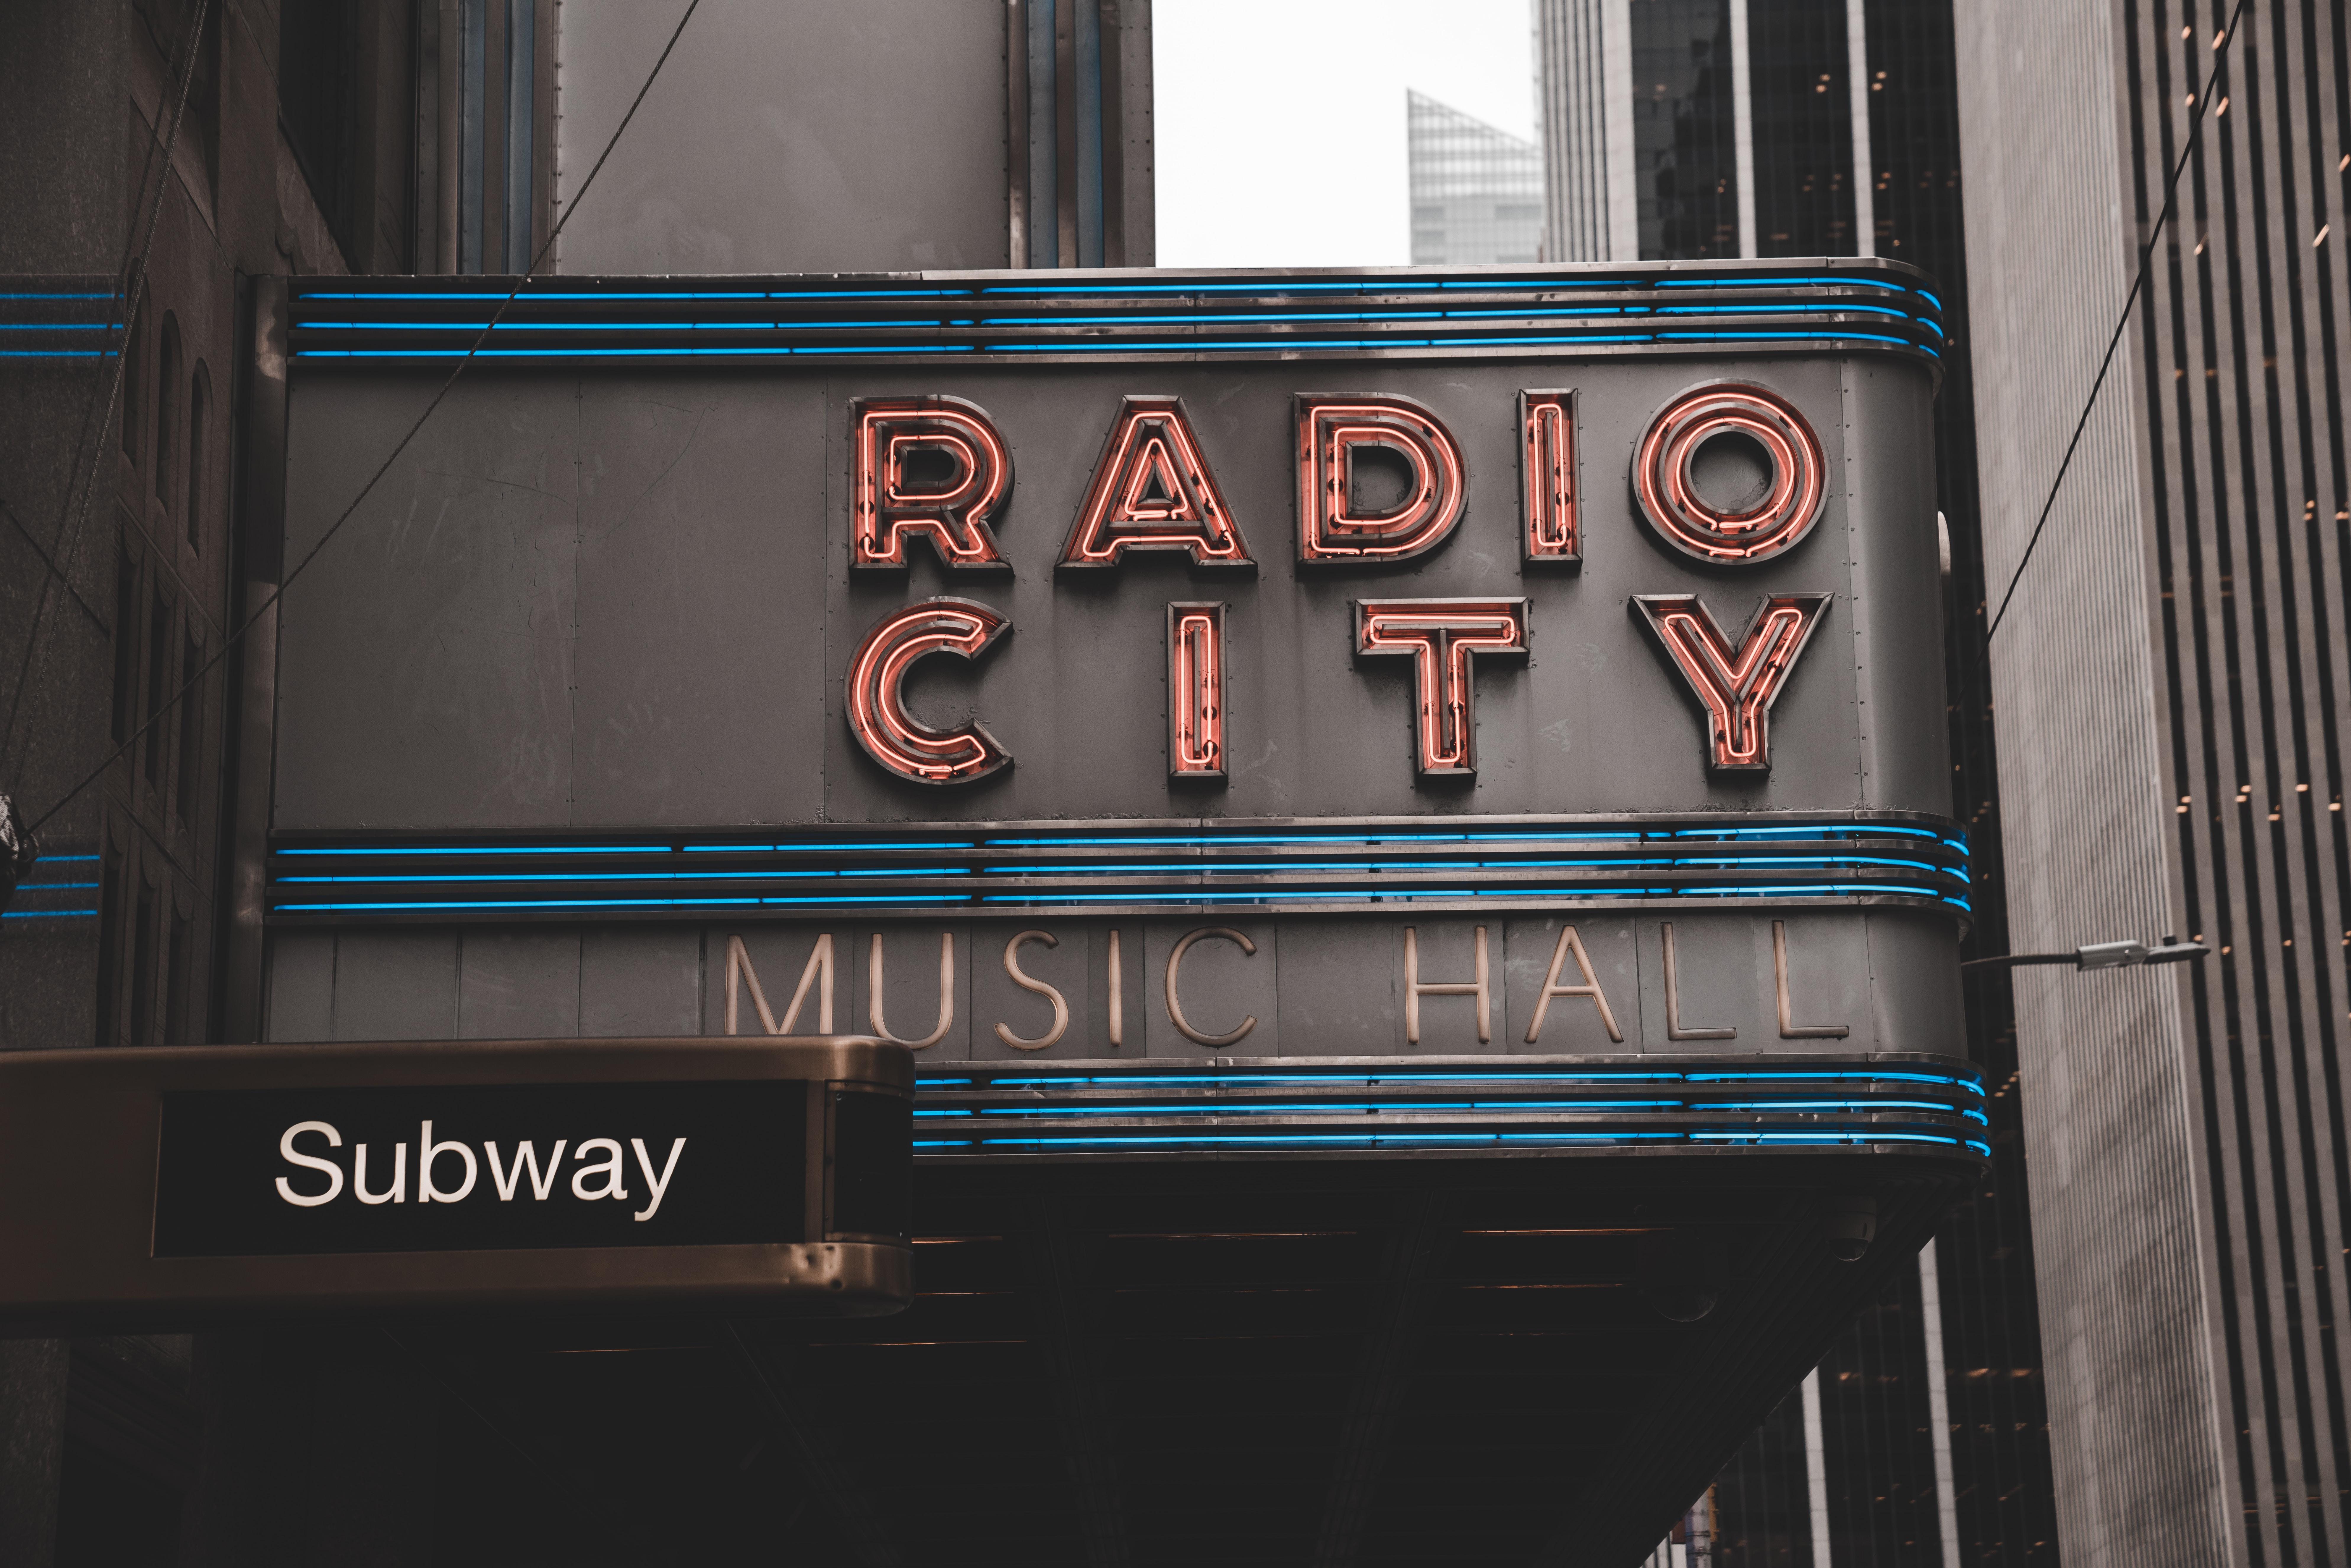 Radio City Music Hall Subway